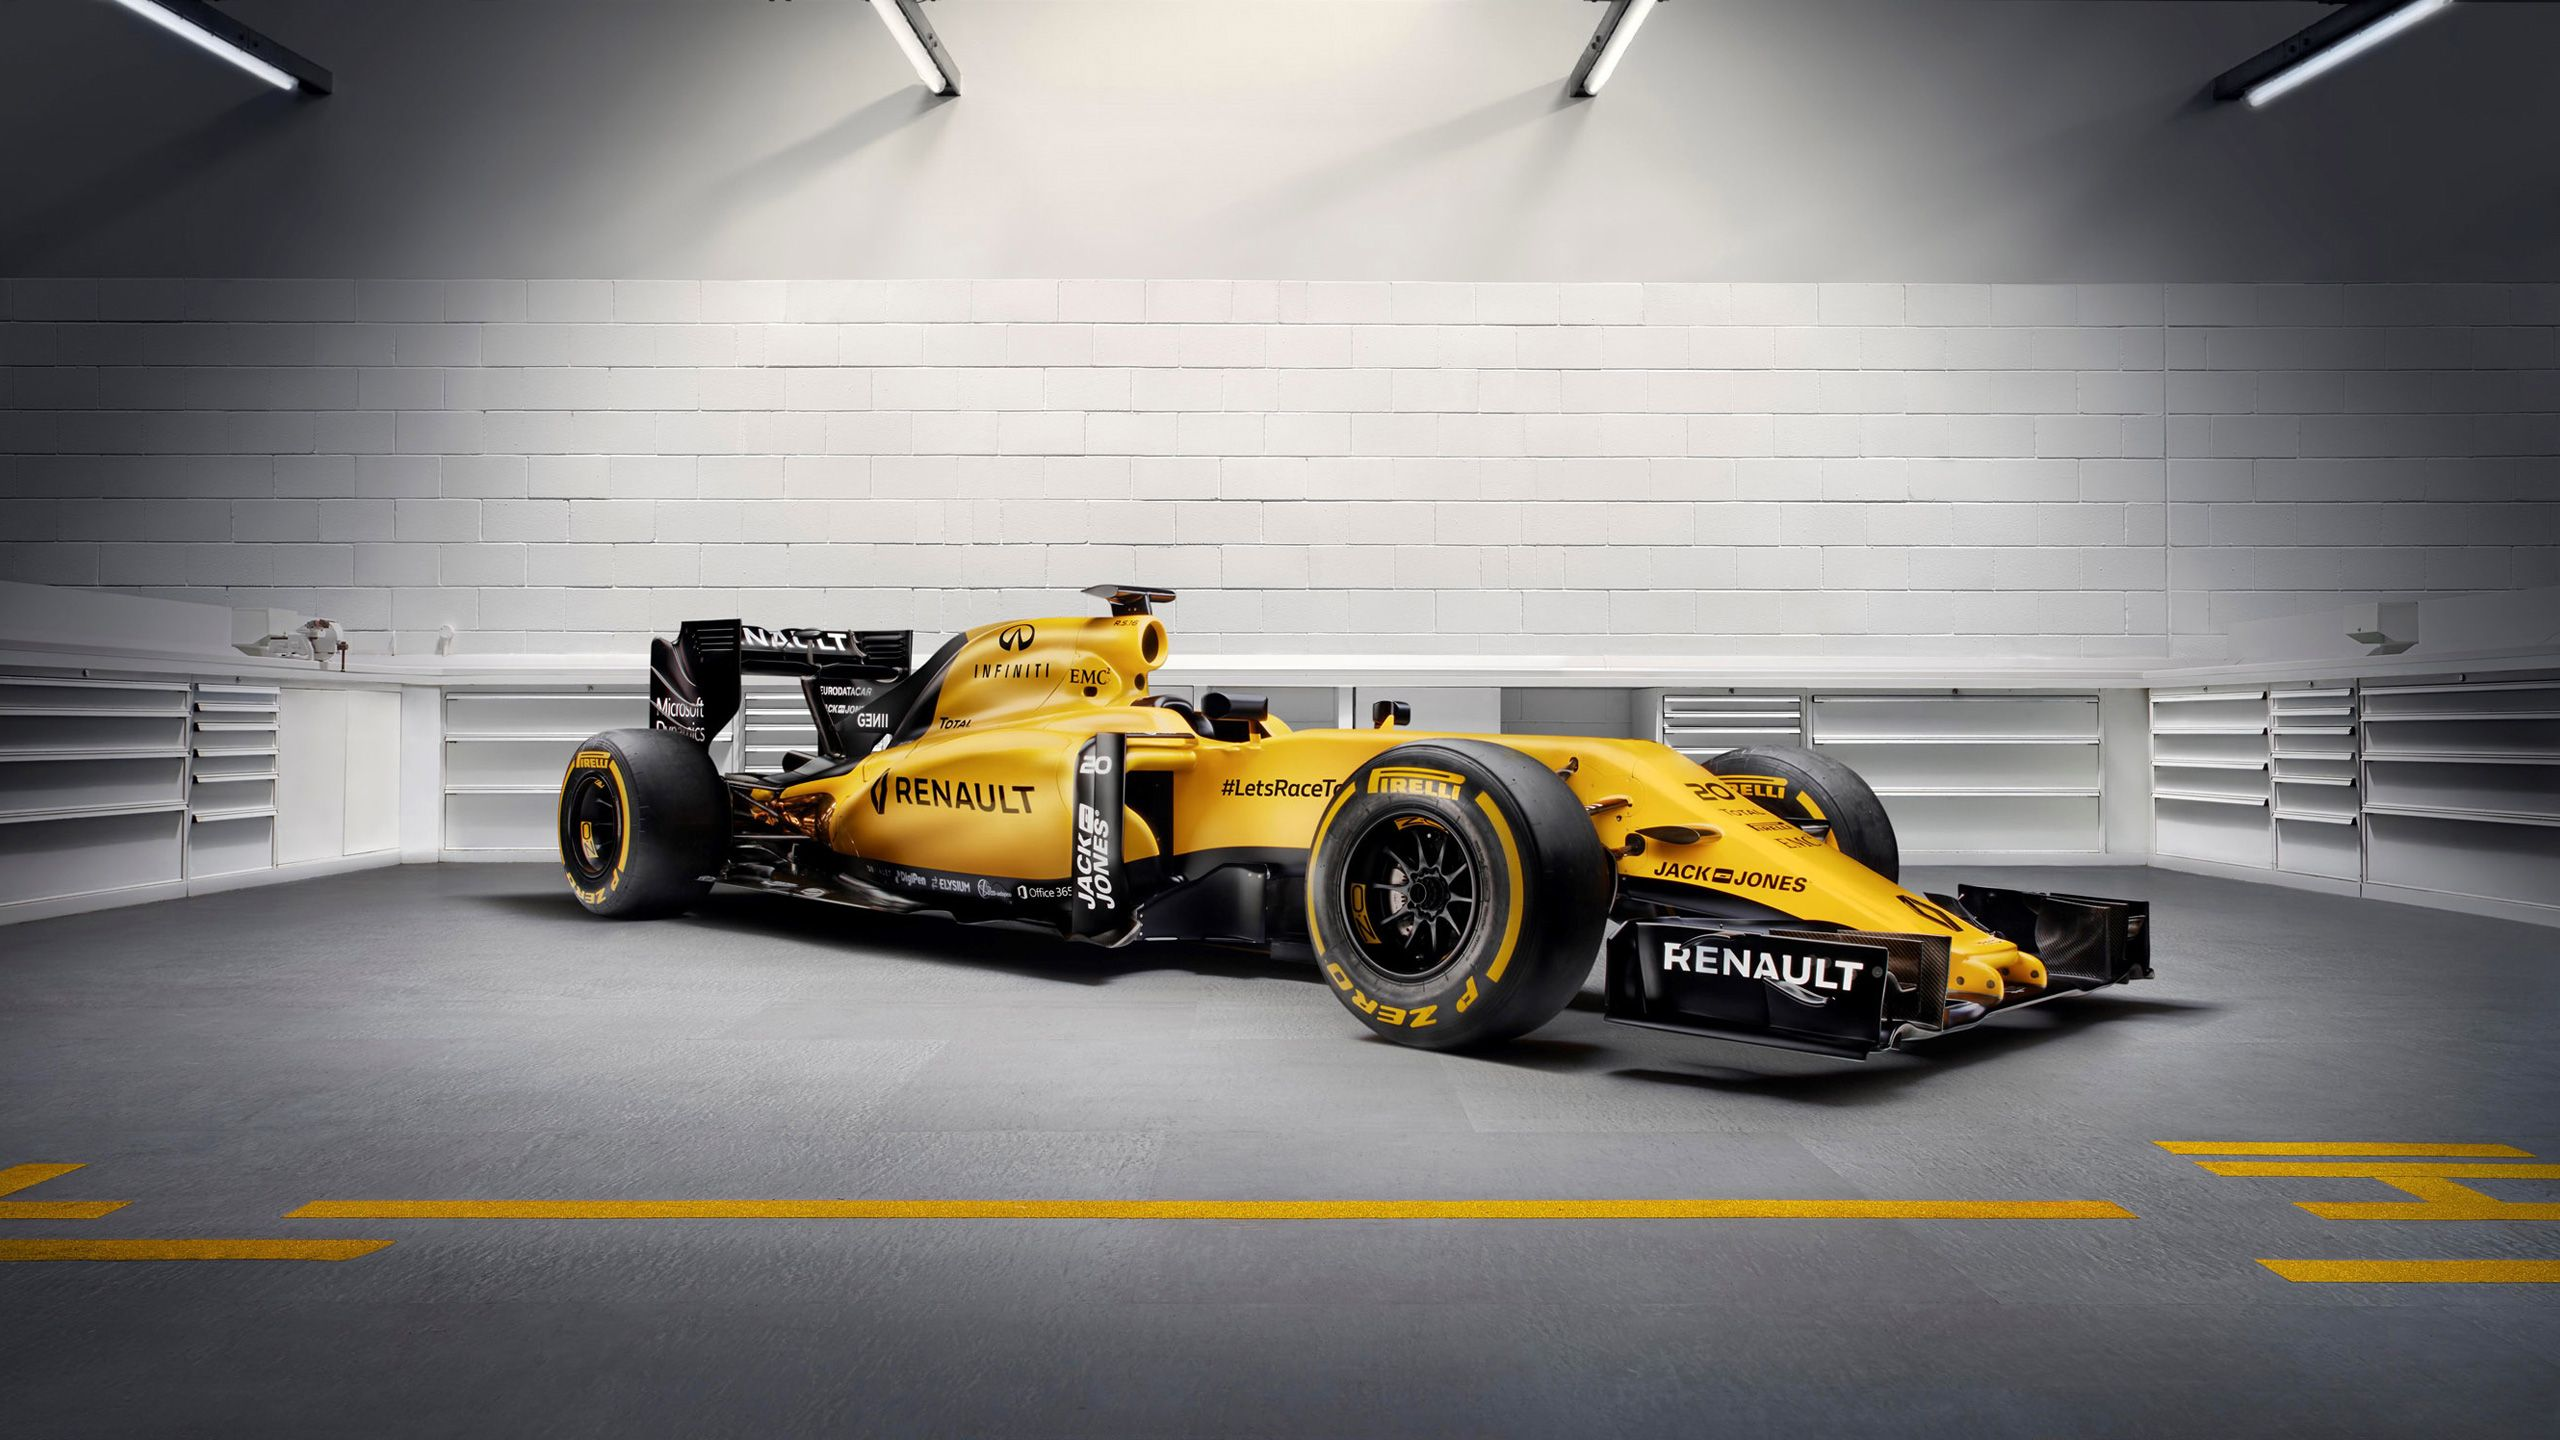 Formula 1 Wallpapers Top Free Formula 1 Backgrounds